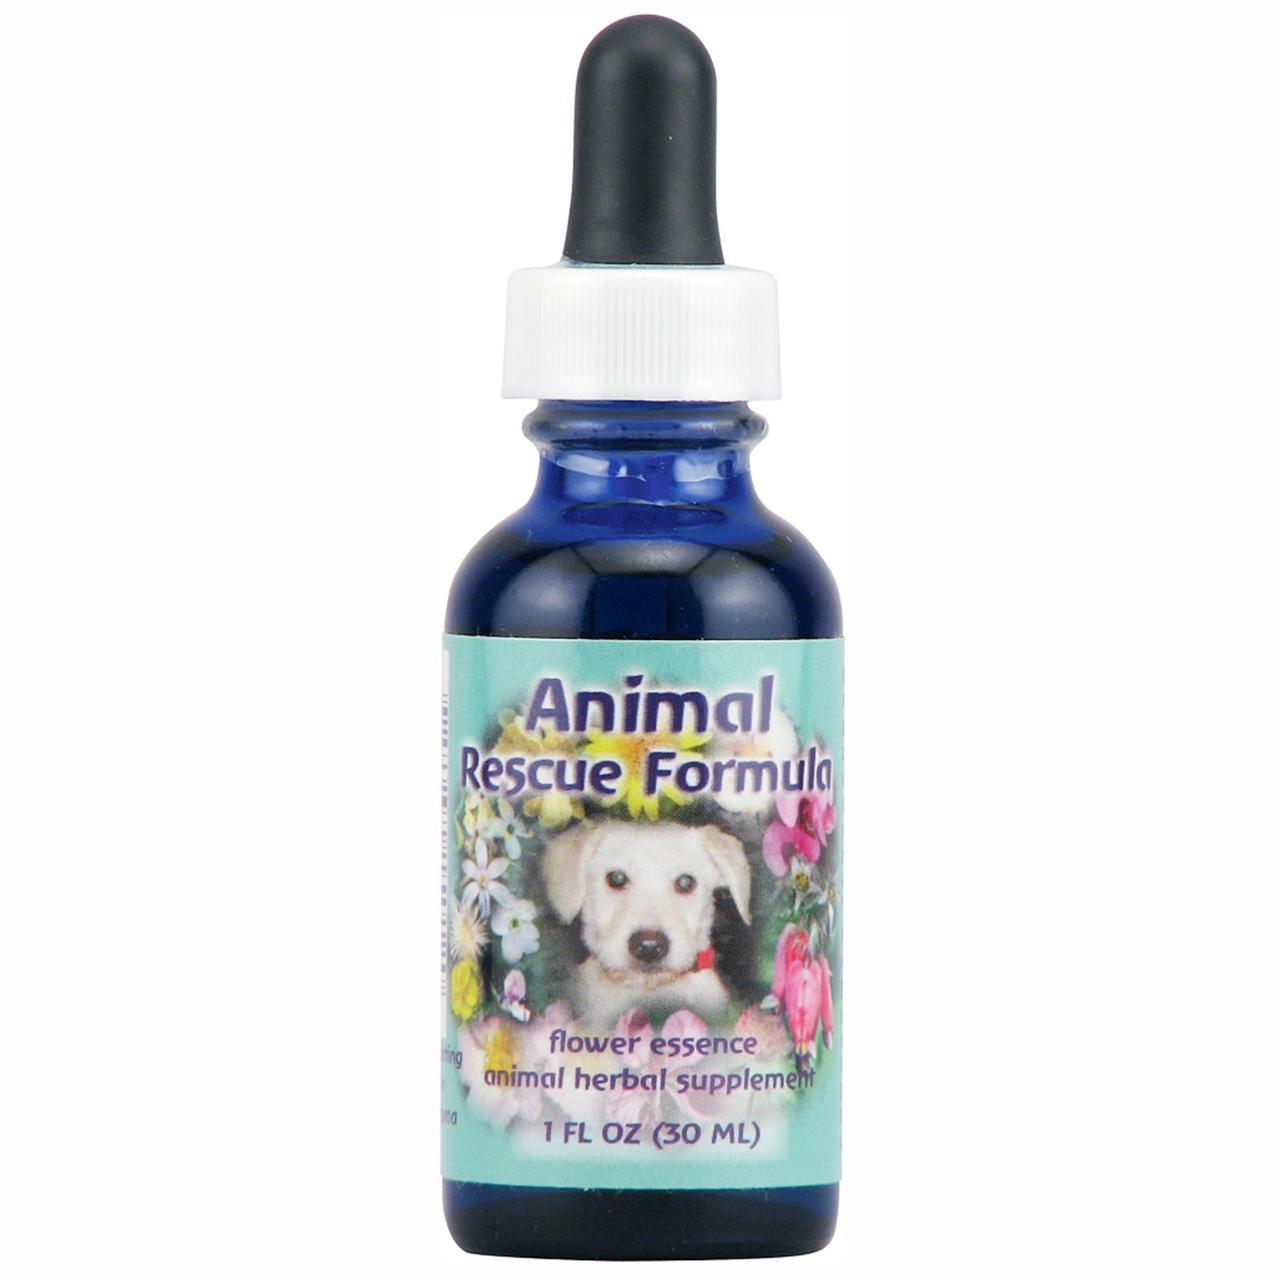 Flower Essence Services, Animal Relief Formula, Flower Essence Spray, 1 fl oz (30ml)